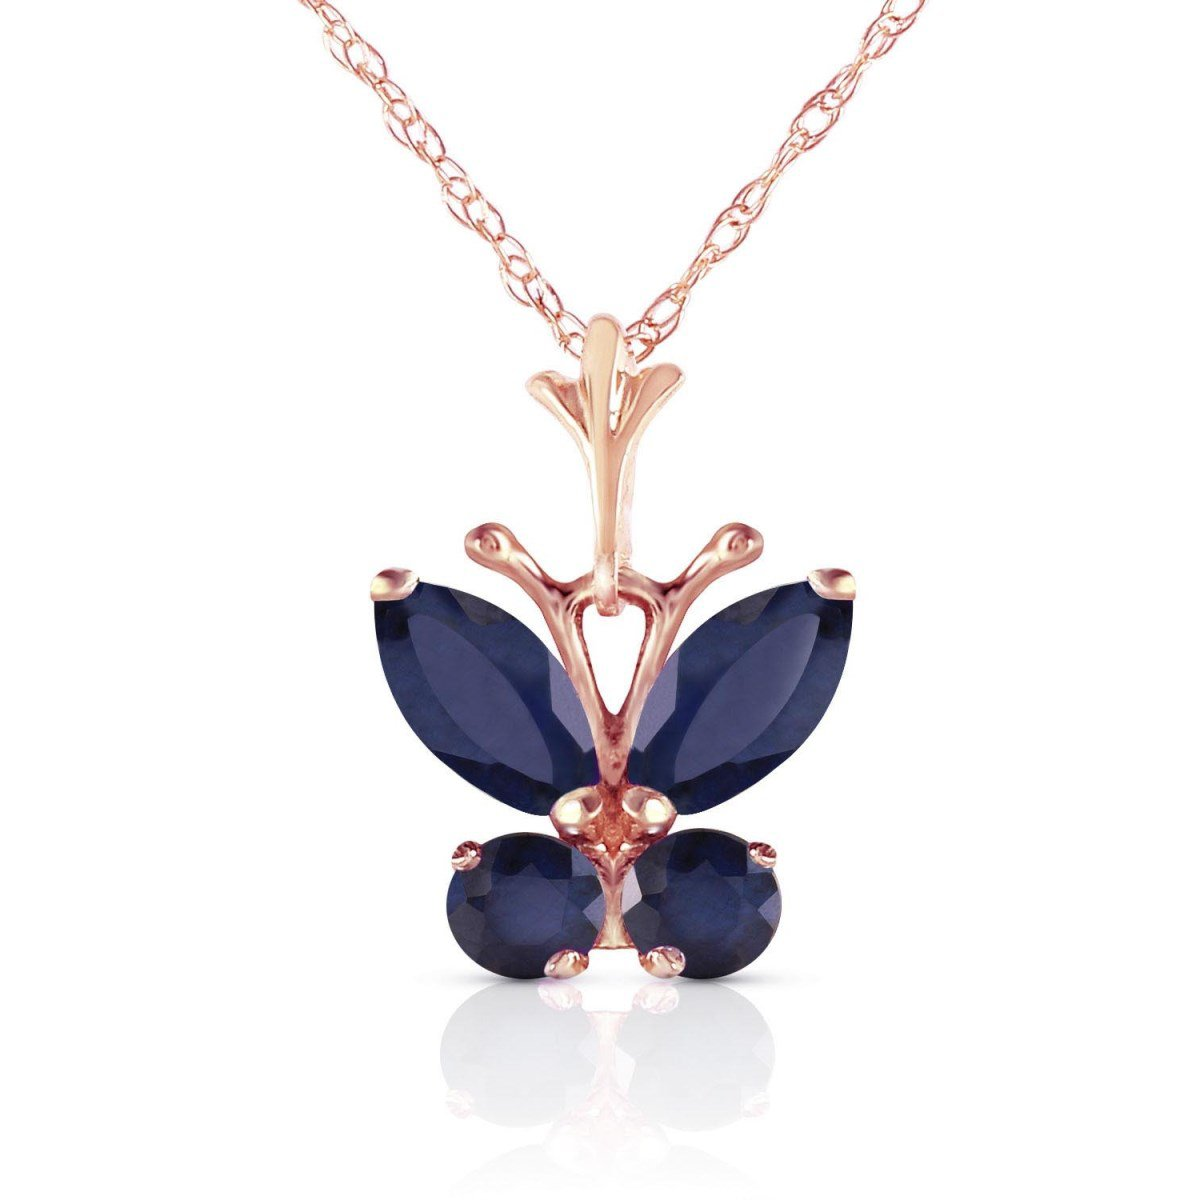 September Birthstone Sapphire Butterfly Pendant Necklace 14k Rose Gold 4631-R